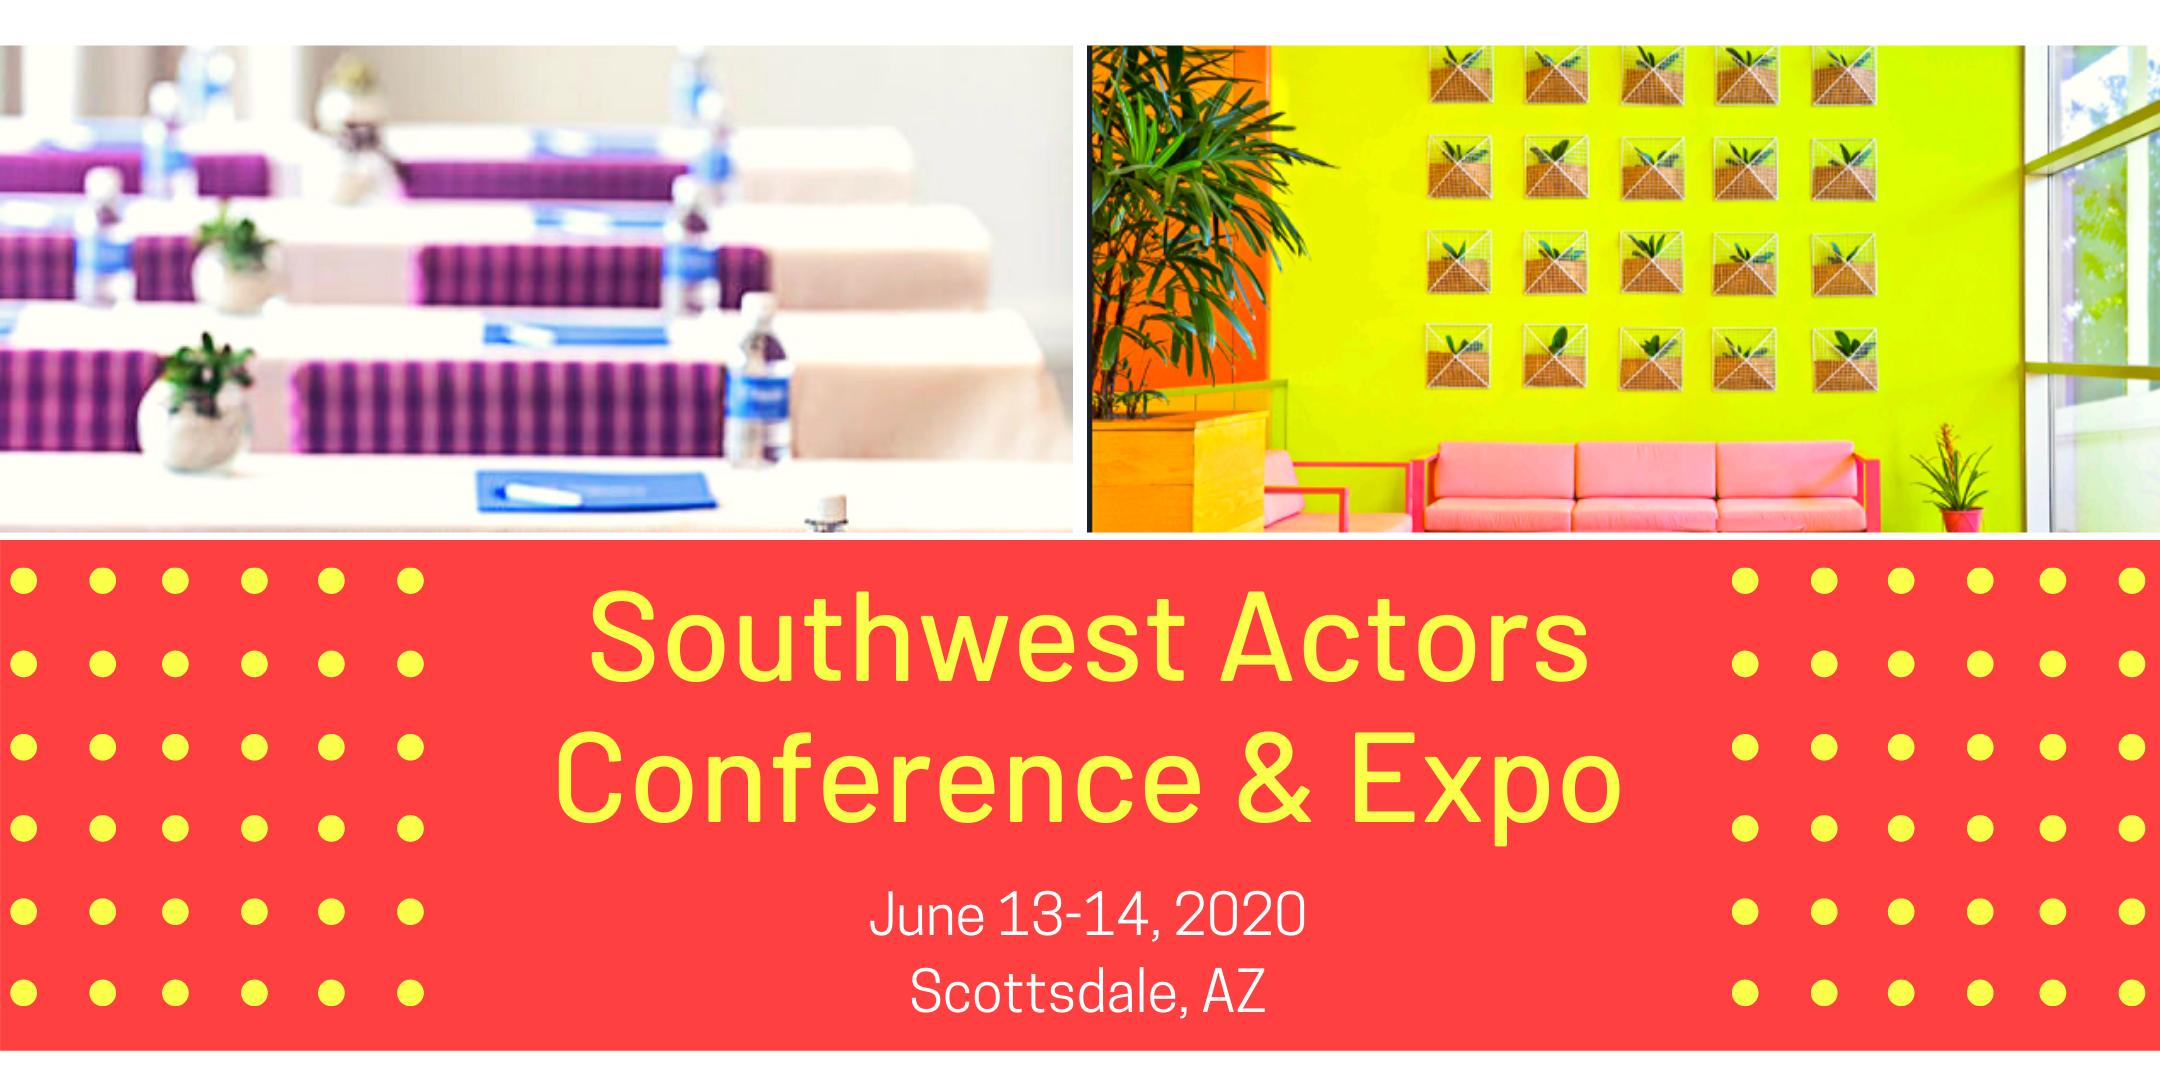 Southwest Actors Conference & Expo 2020